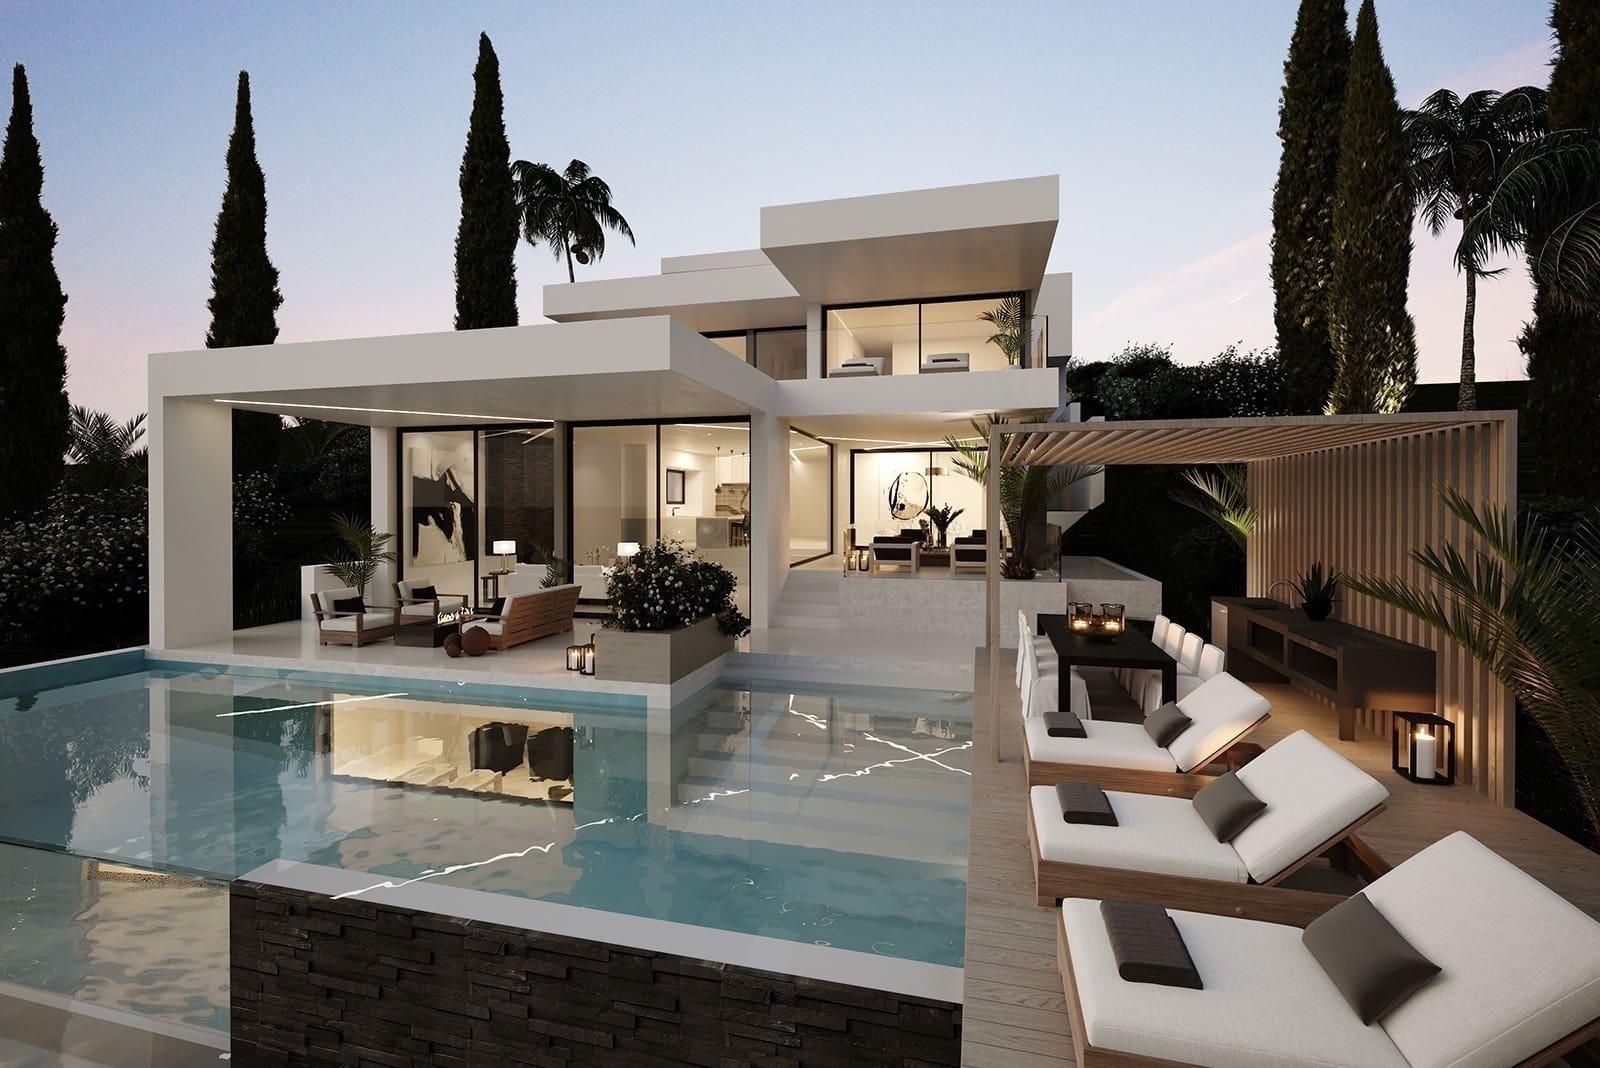 6 bedroom Villa for sale in Marbella with pool - € 1,249,000 (Ref: 4925082)